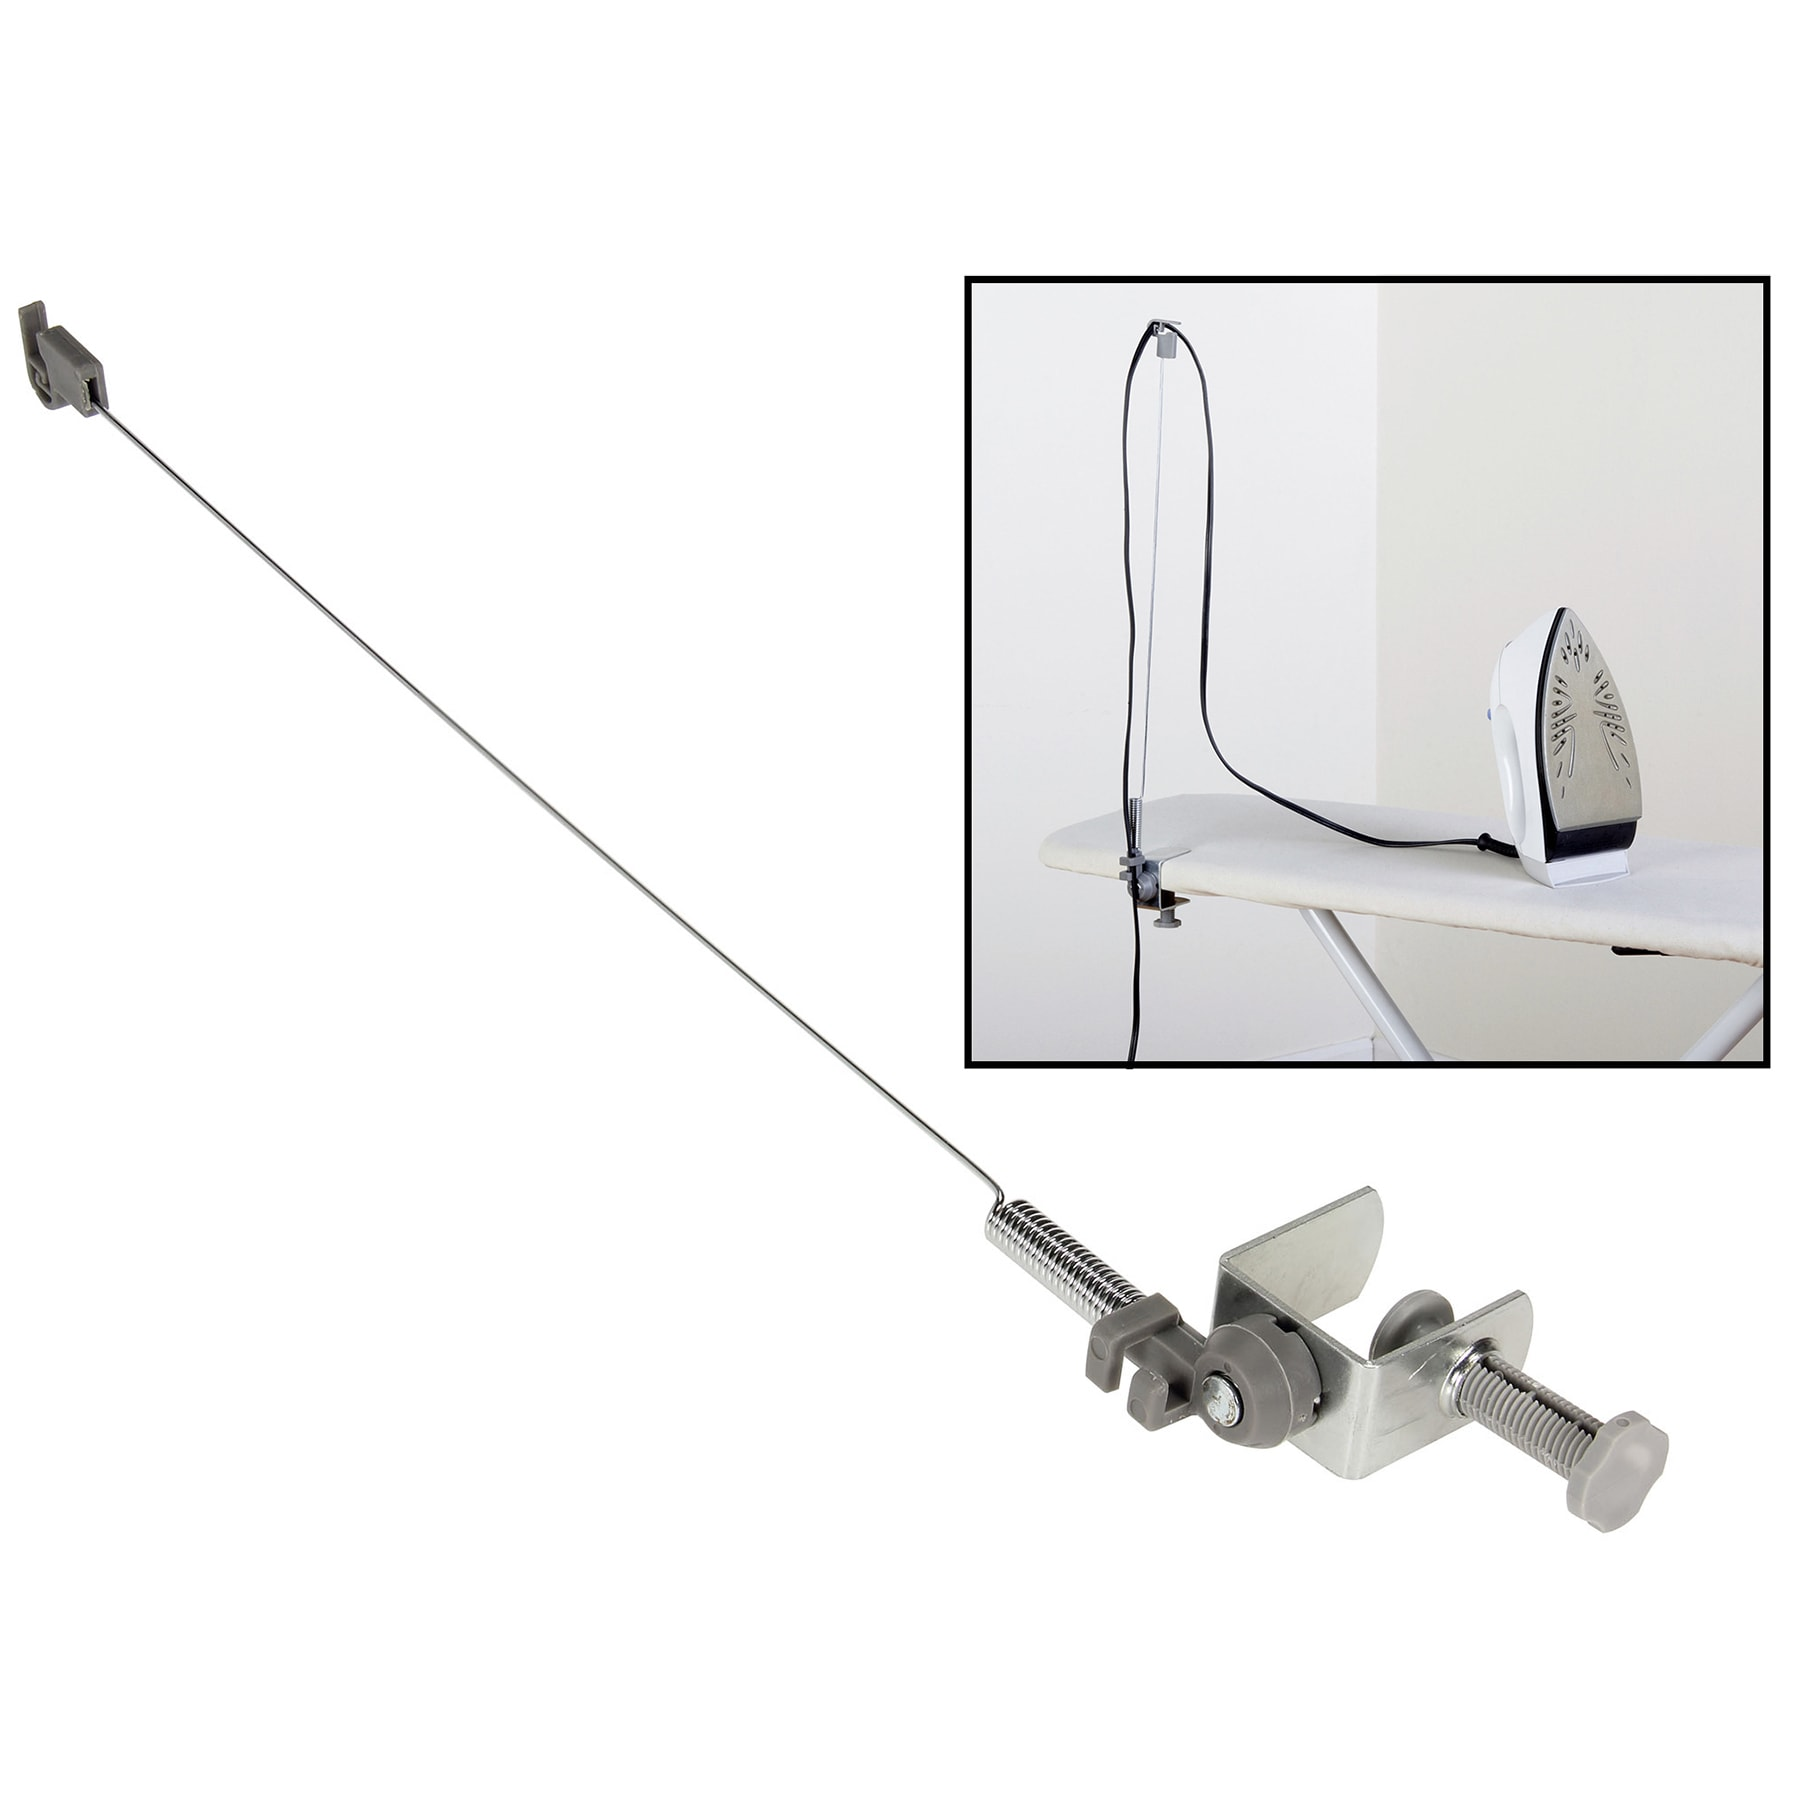 Household Essentials 175 18 Iron Cordminder (Fldng Iron Crd Mindr)